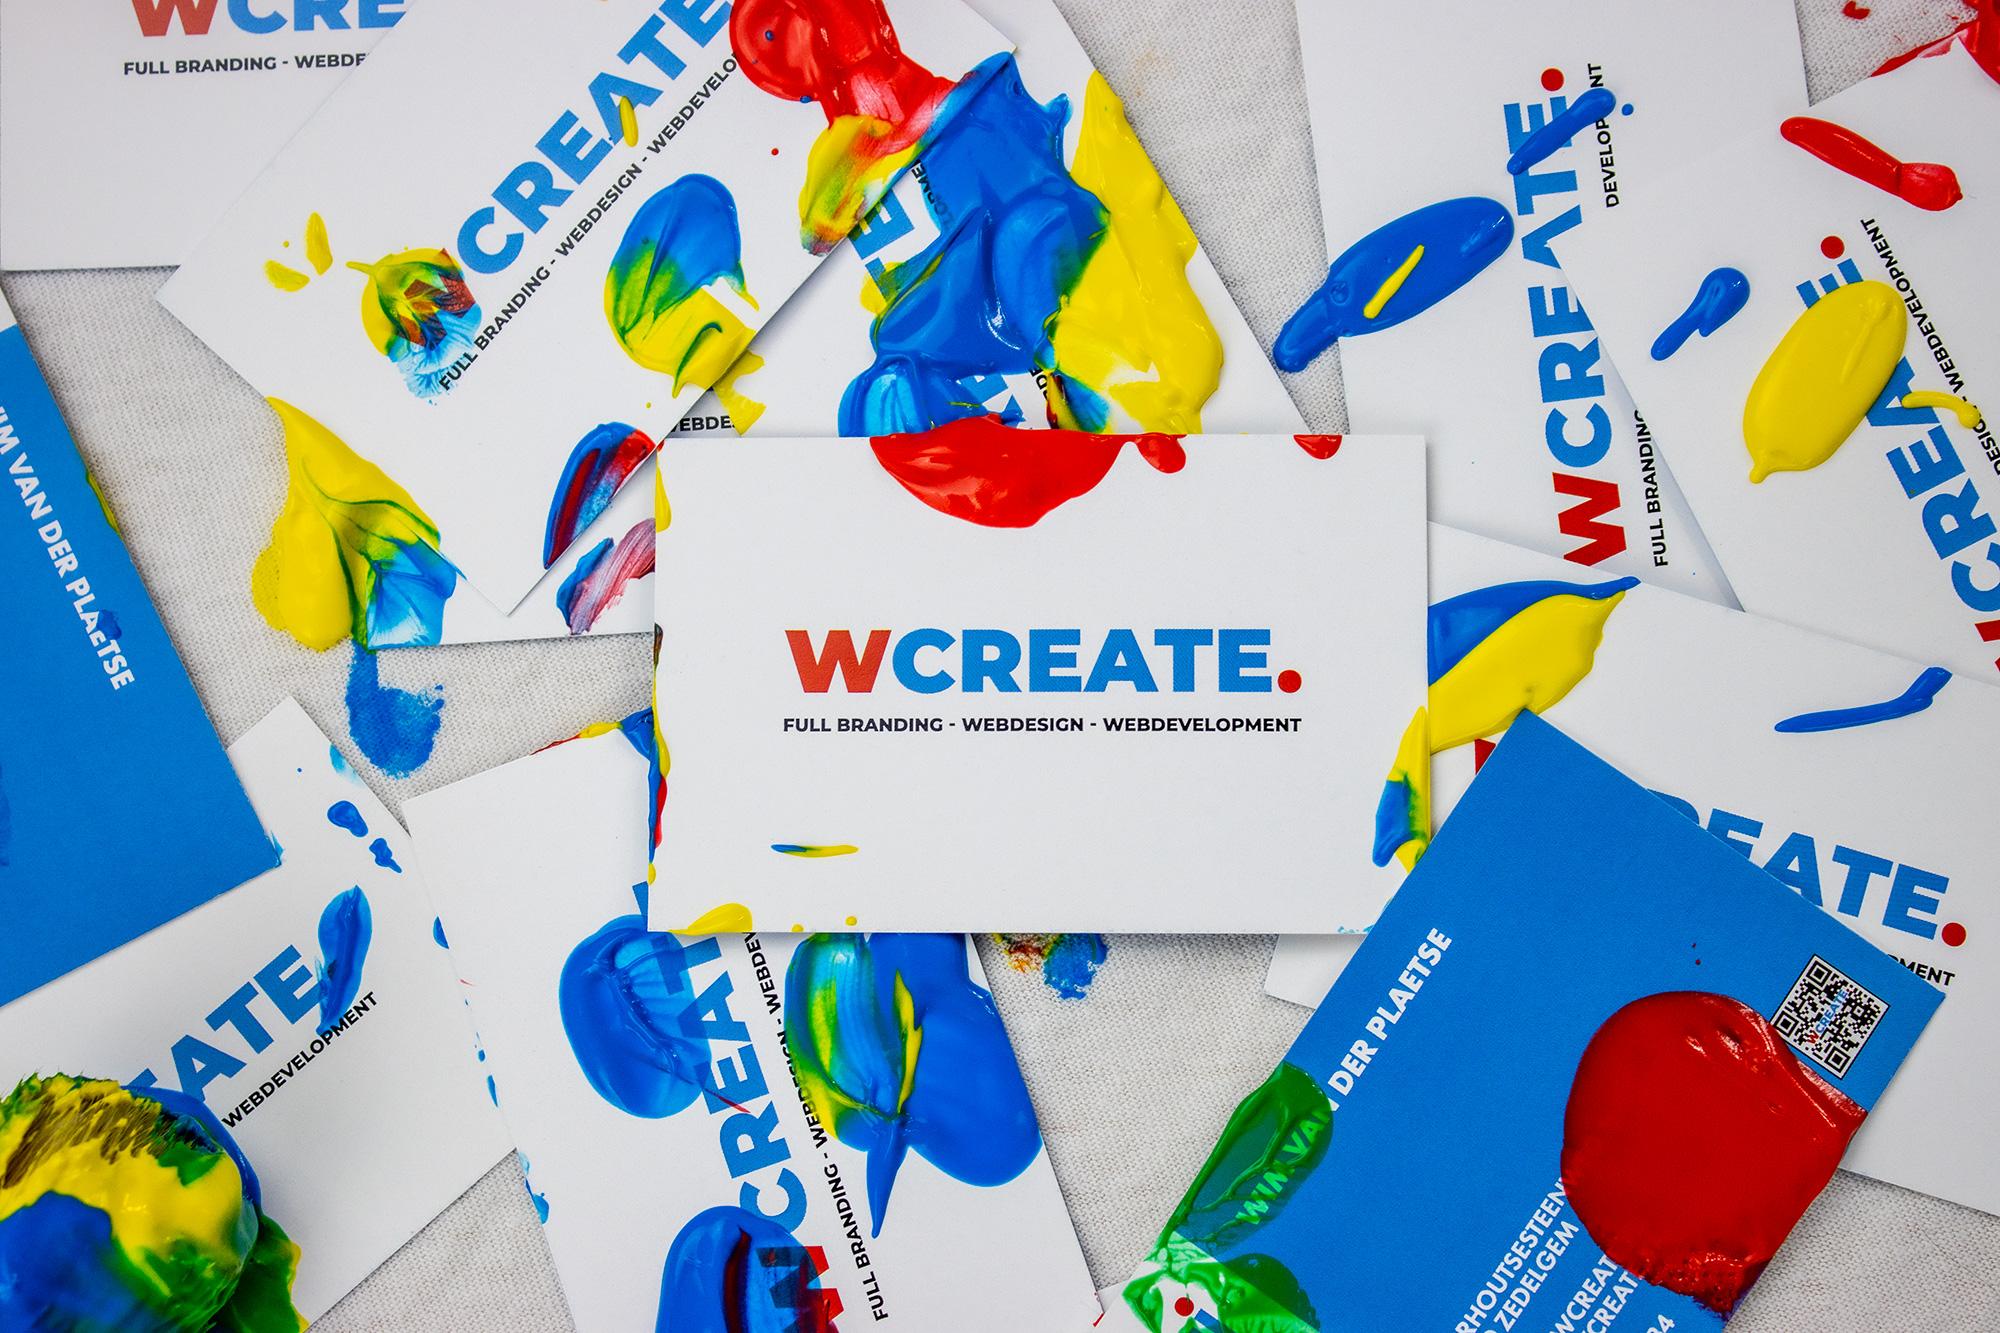 webdesign en branding bureau - wcreate